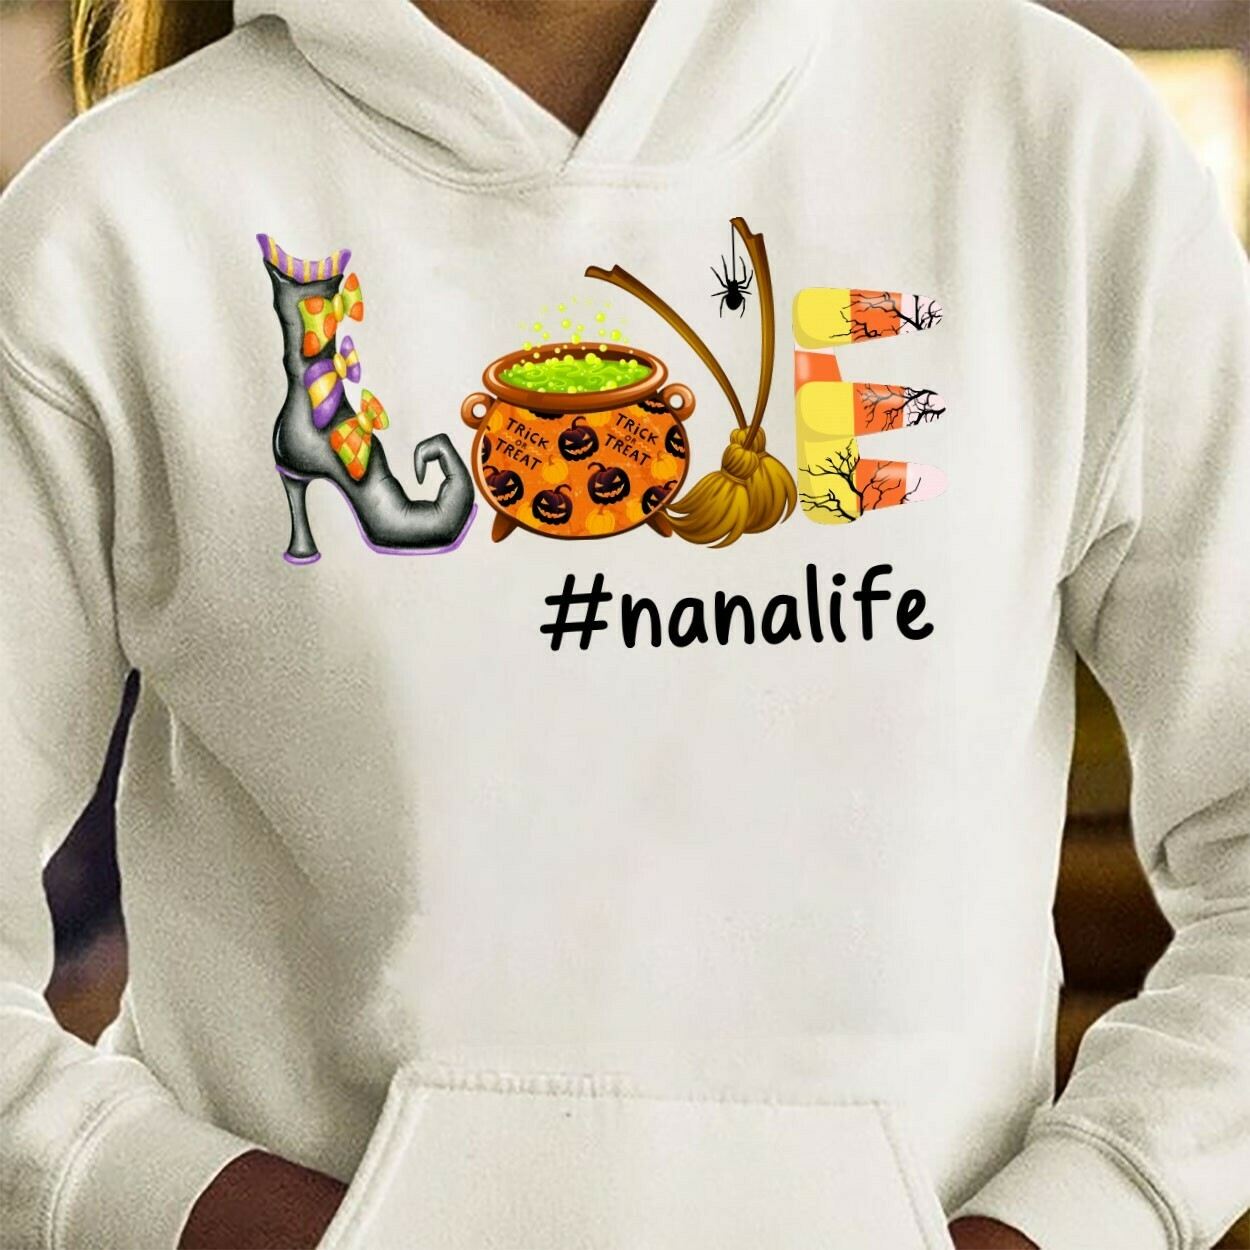 Love Nanalife Halloween Gifts T-Shirts for Nana Grandmother Mother Family On Halloween Vacation Shirt Tee Long Sleeve Sweatshirt Hoodie Jolly Family Gifts